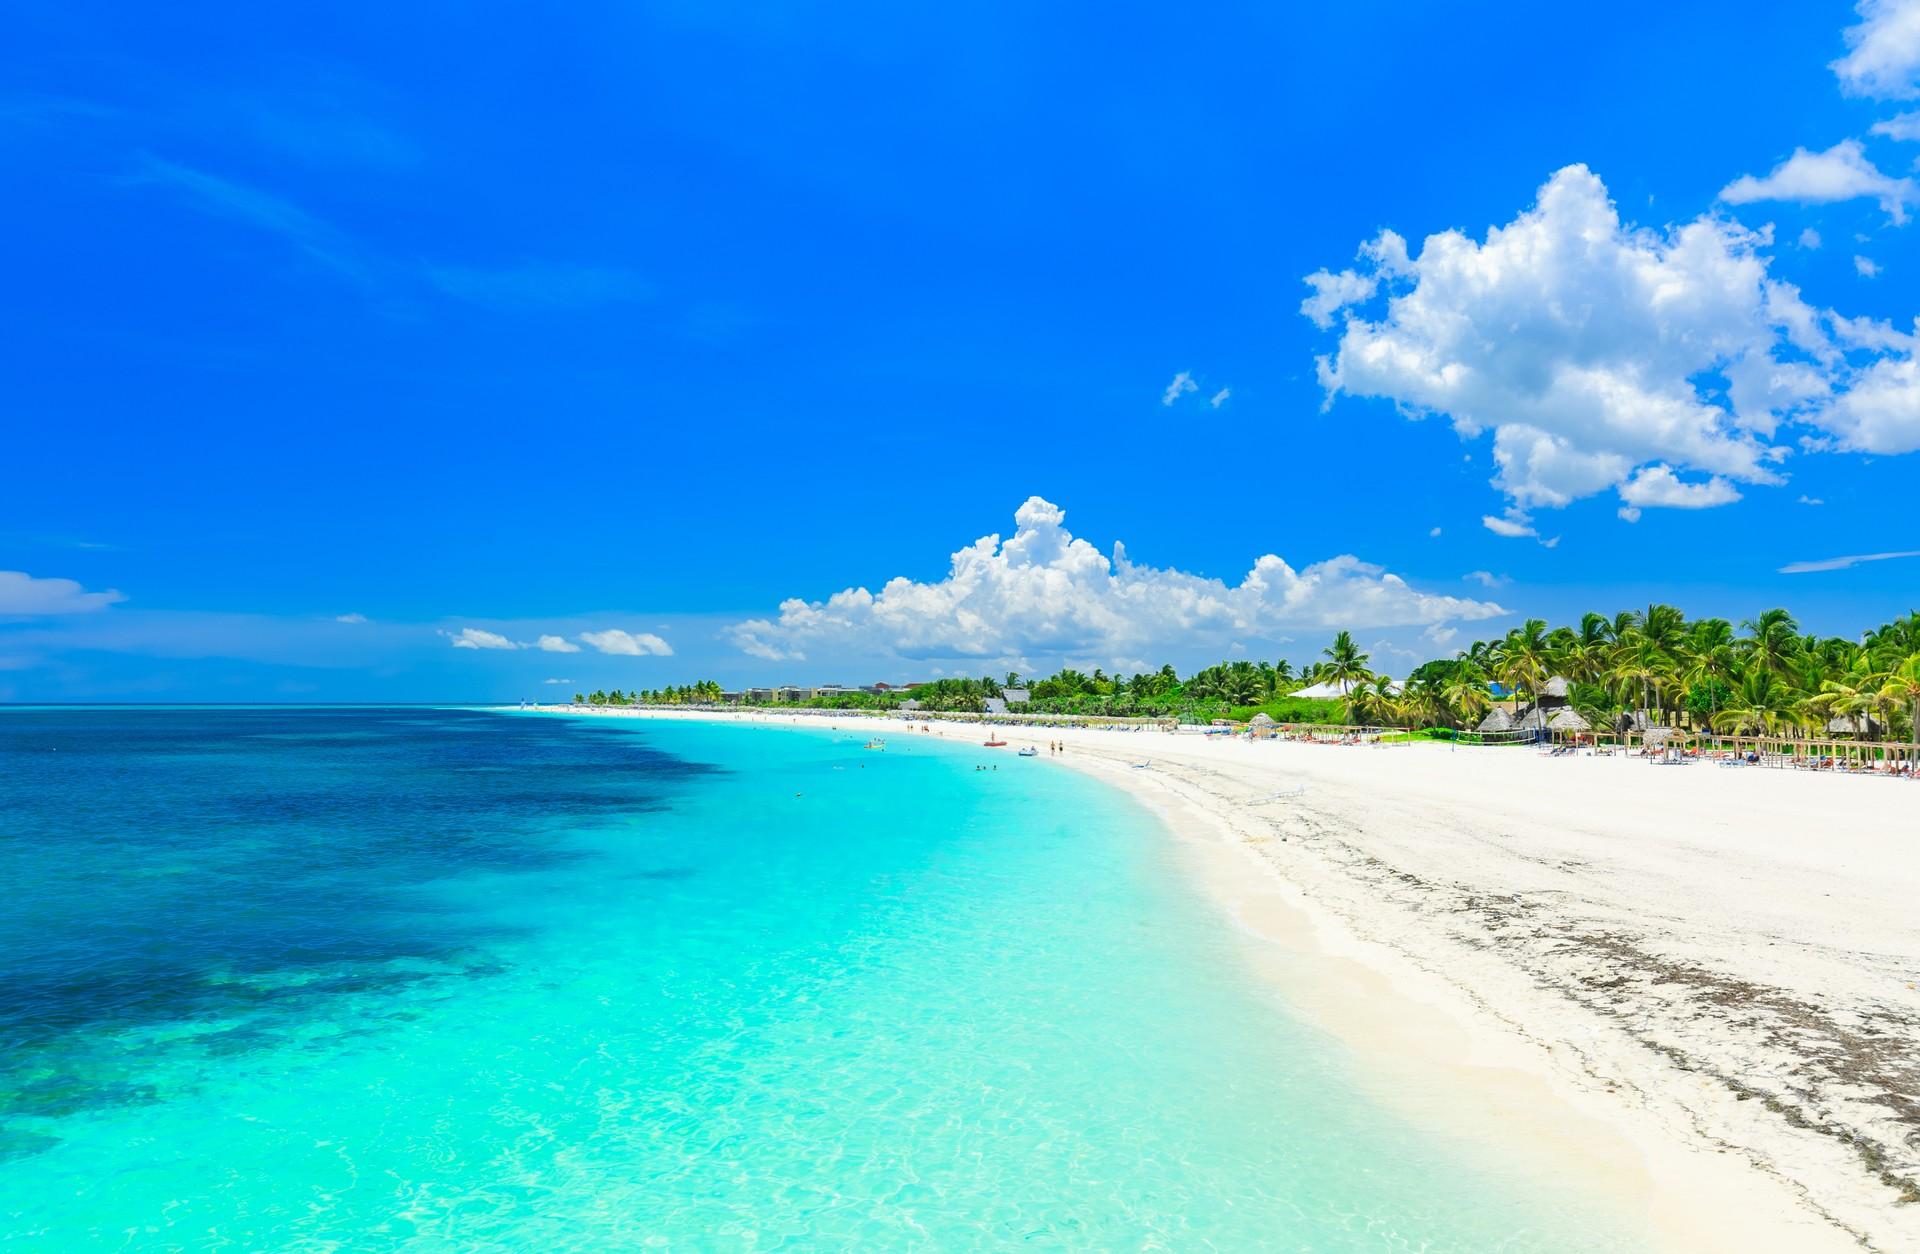 Cayo Coco Island, Cuba